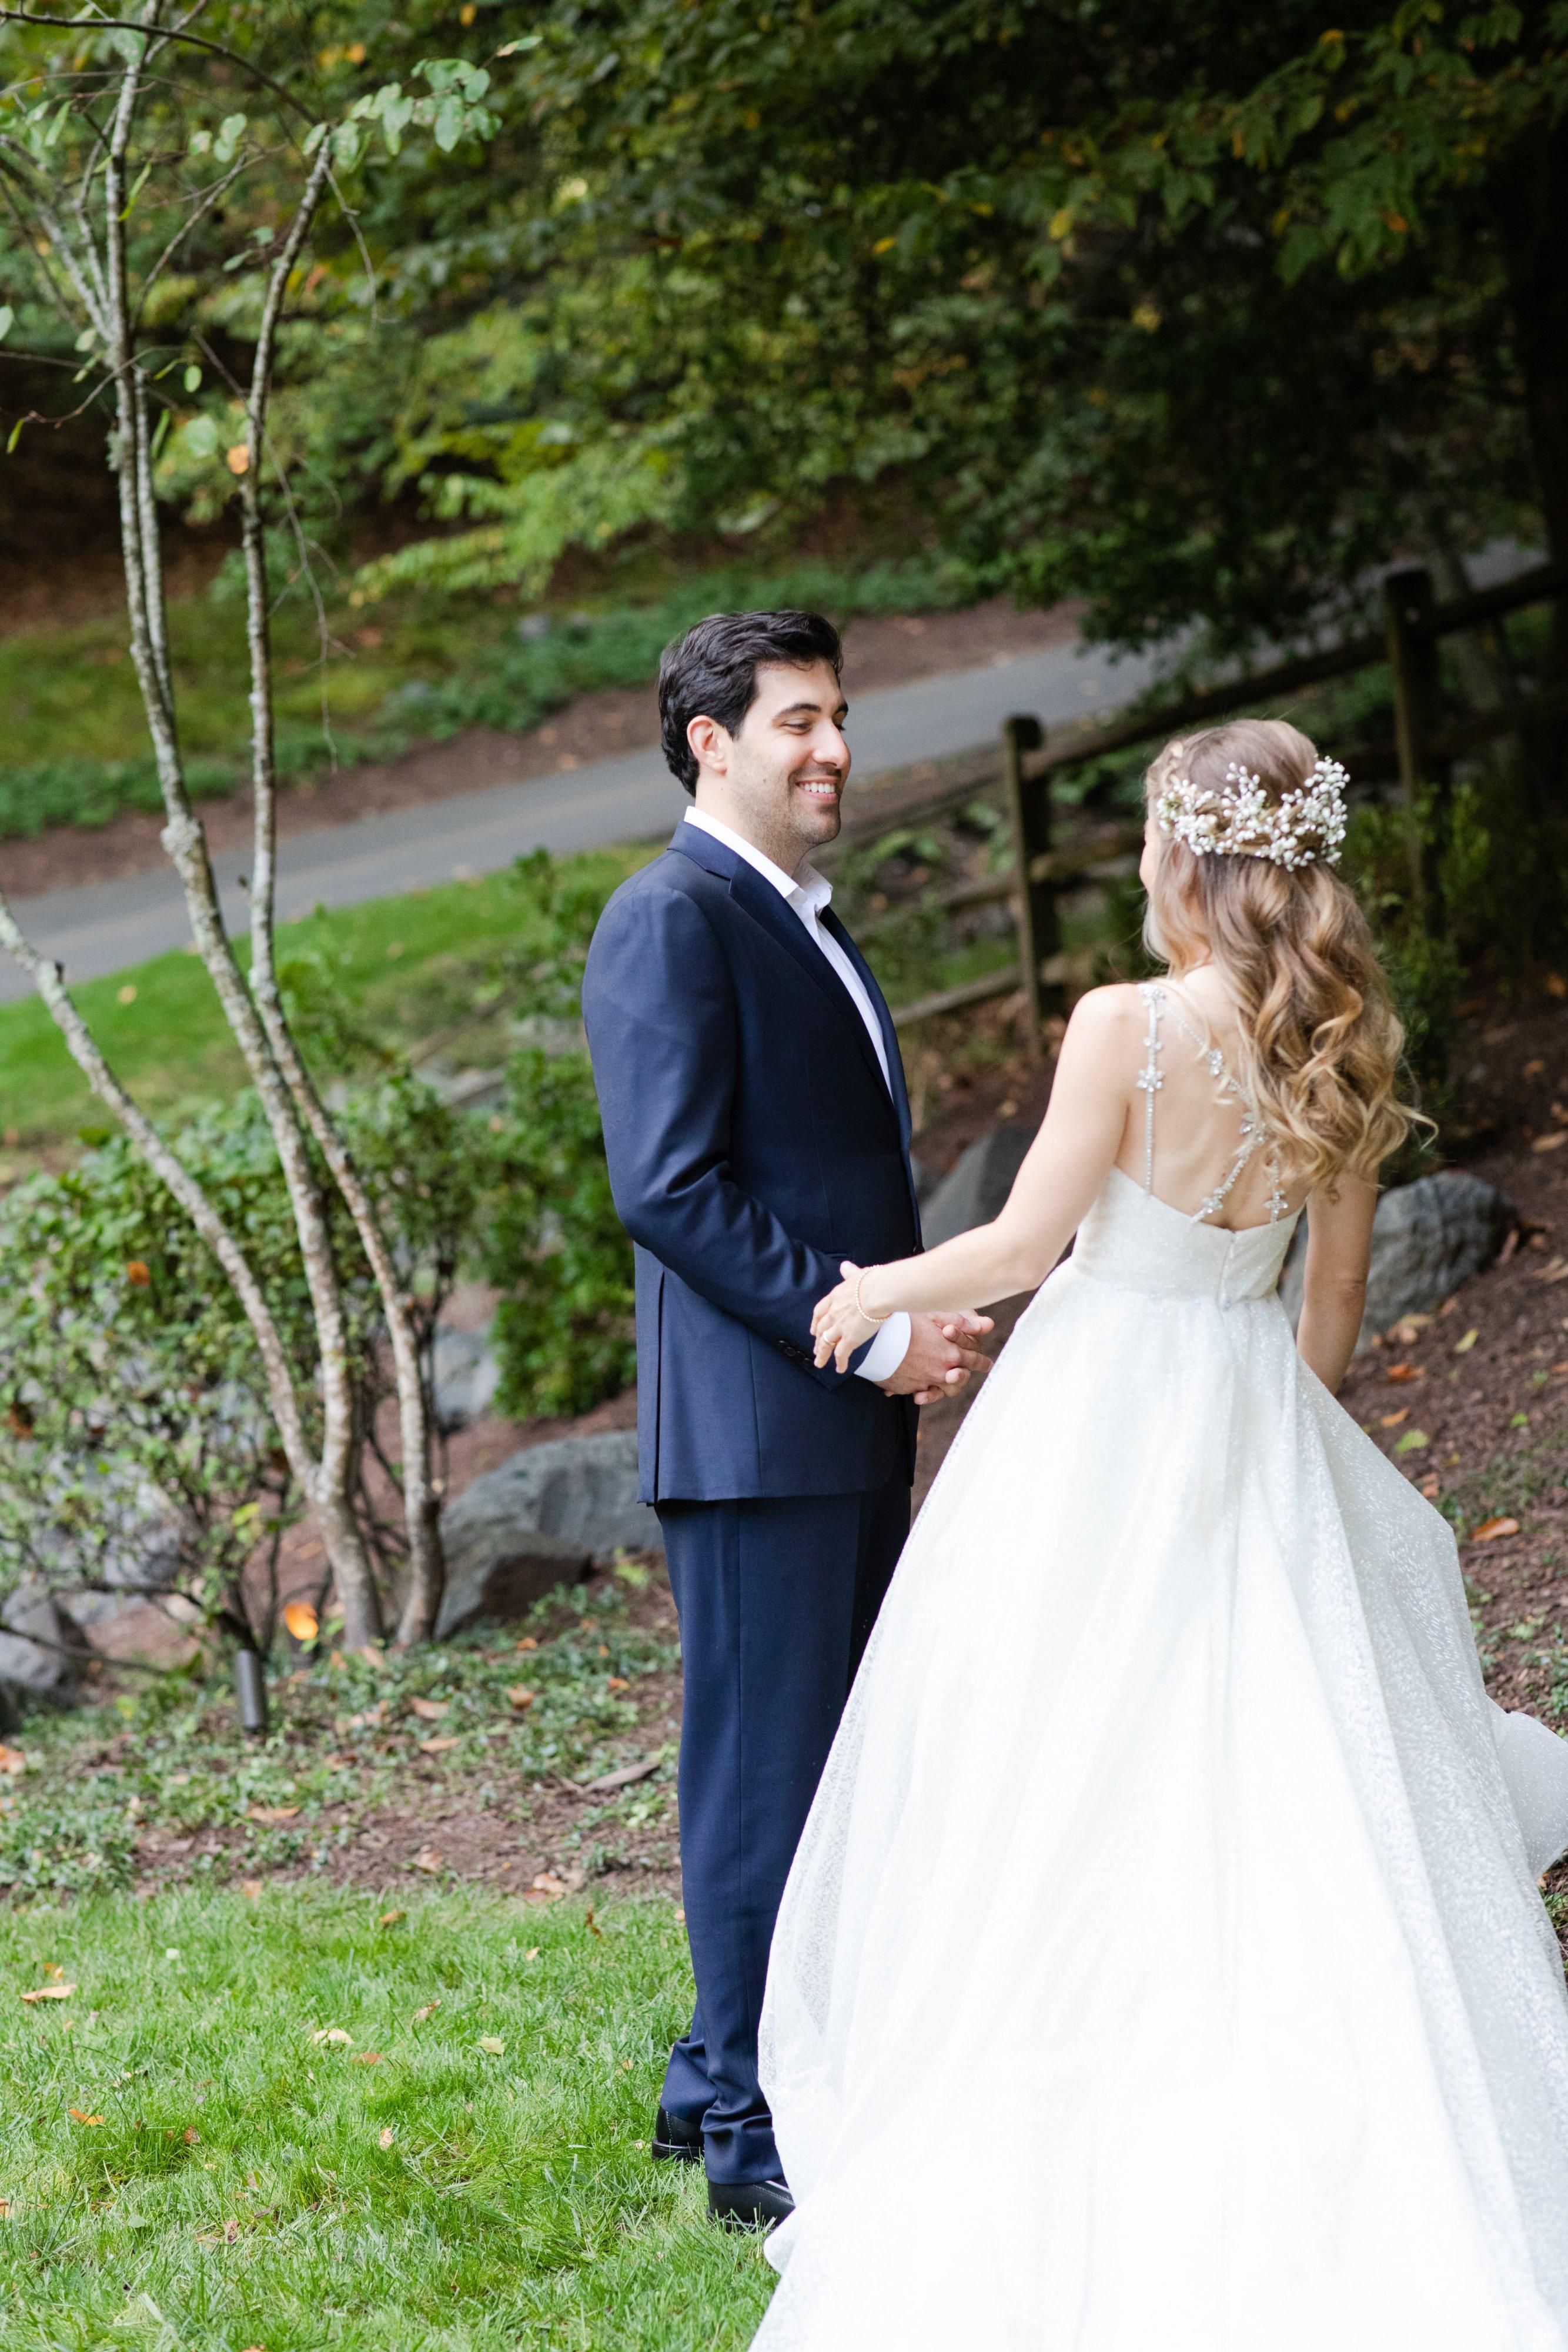 StefanieKamermanPhotography-MelanieandBenjamin-Wedding-Bethesda,MD-2019-10-12-112